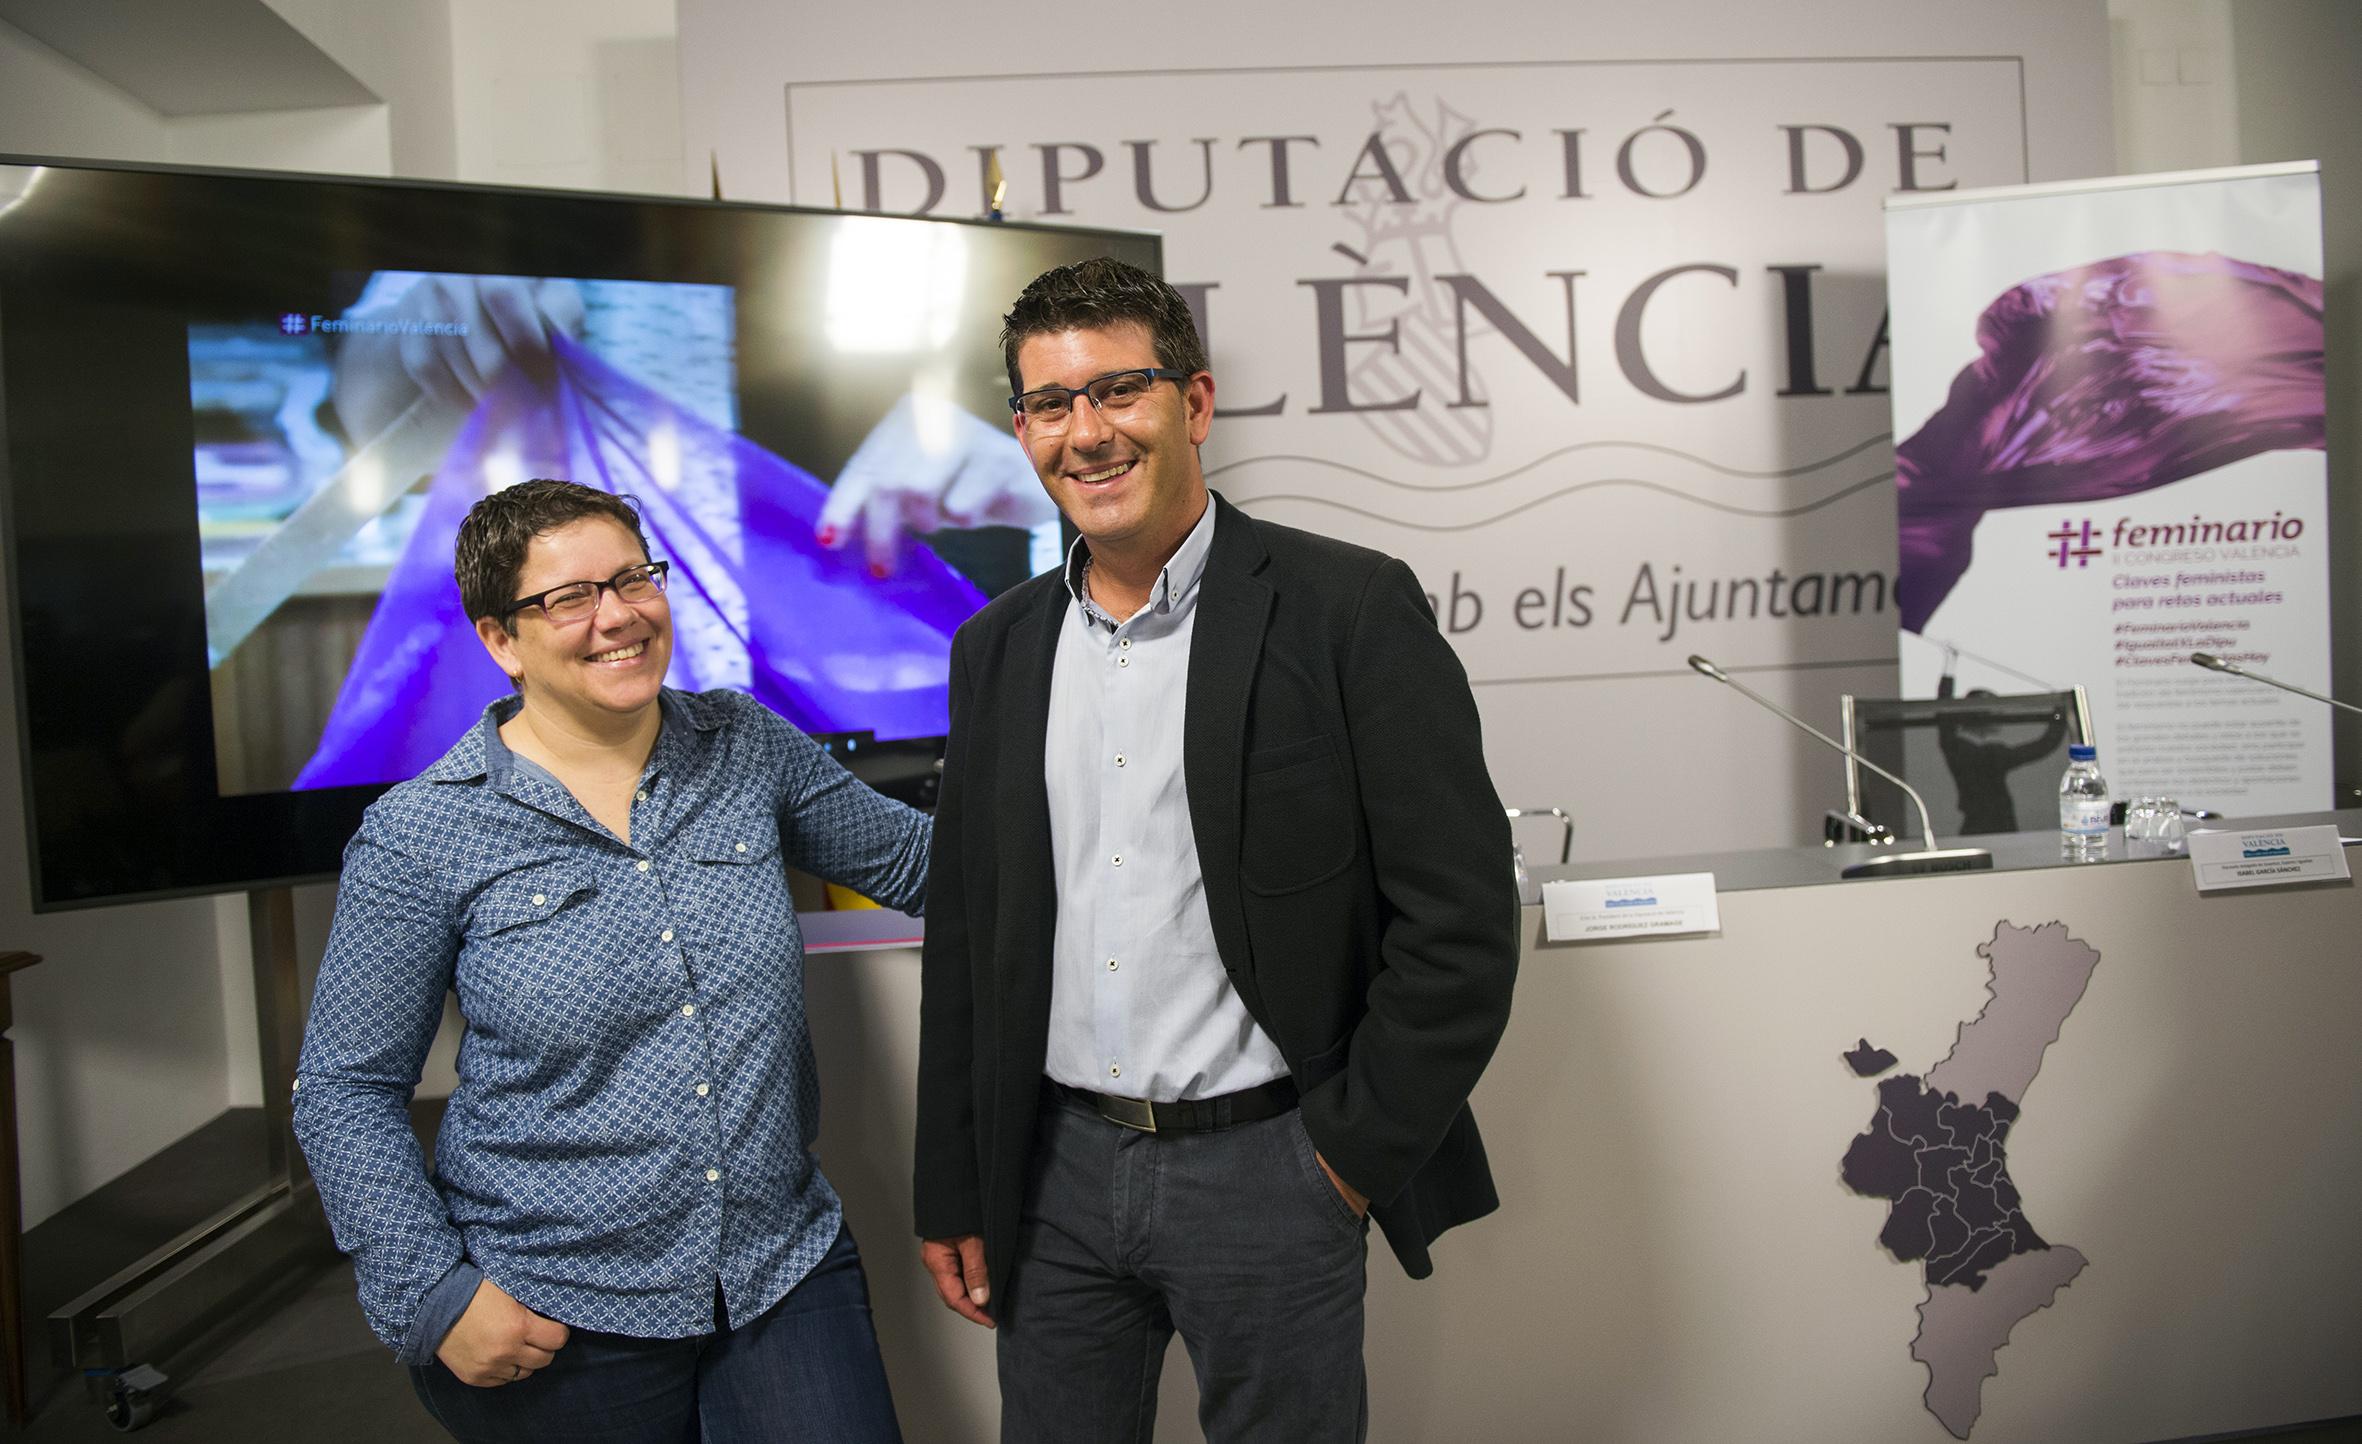 El president de la Diputació Jorge Rodríguez junto a la diputada de Igualdad, Isabel García.